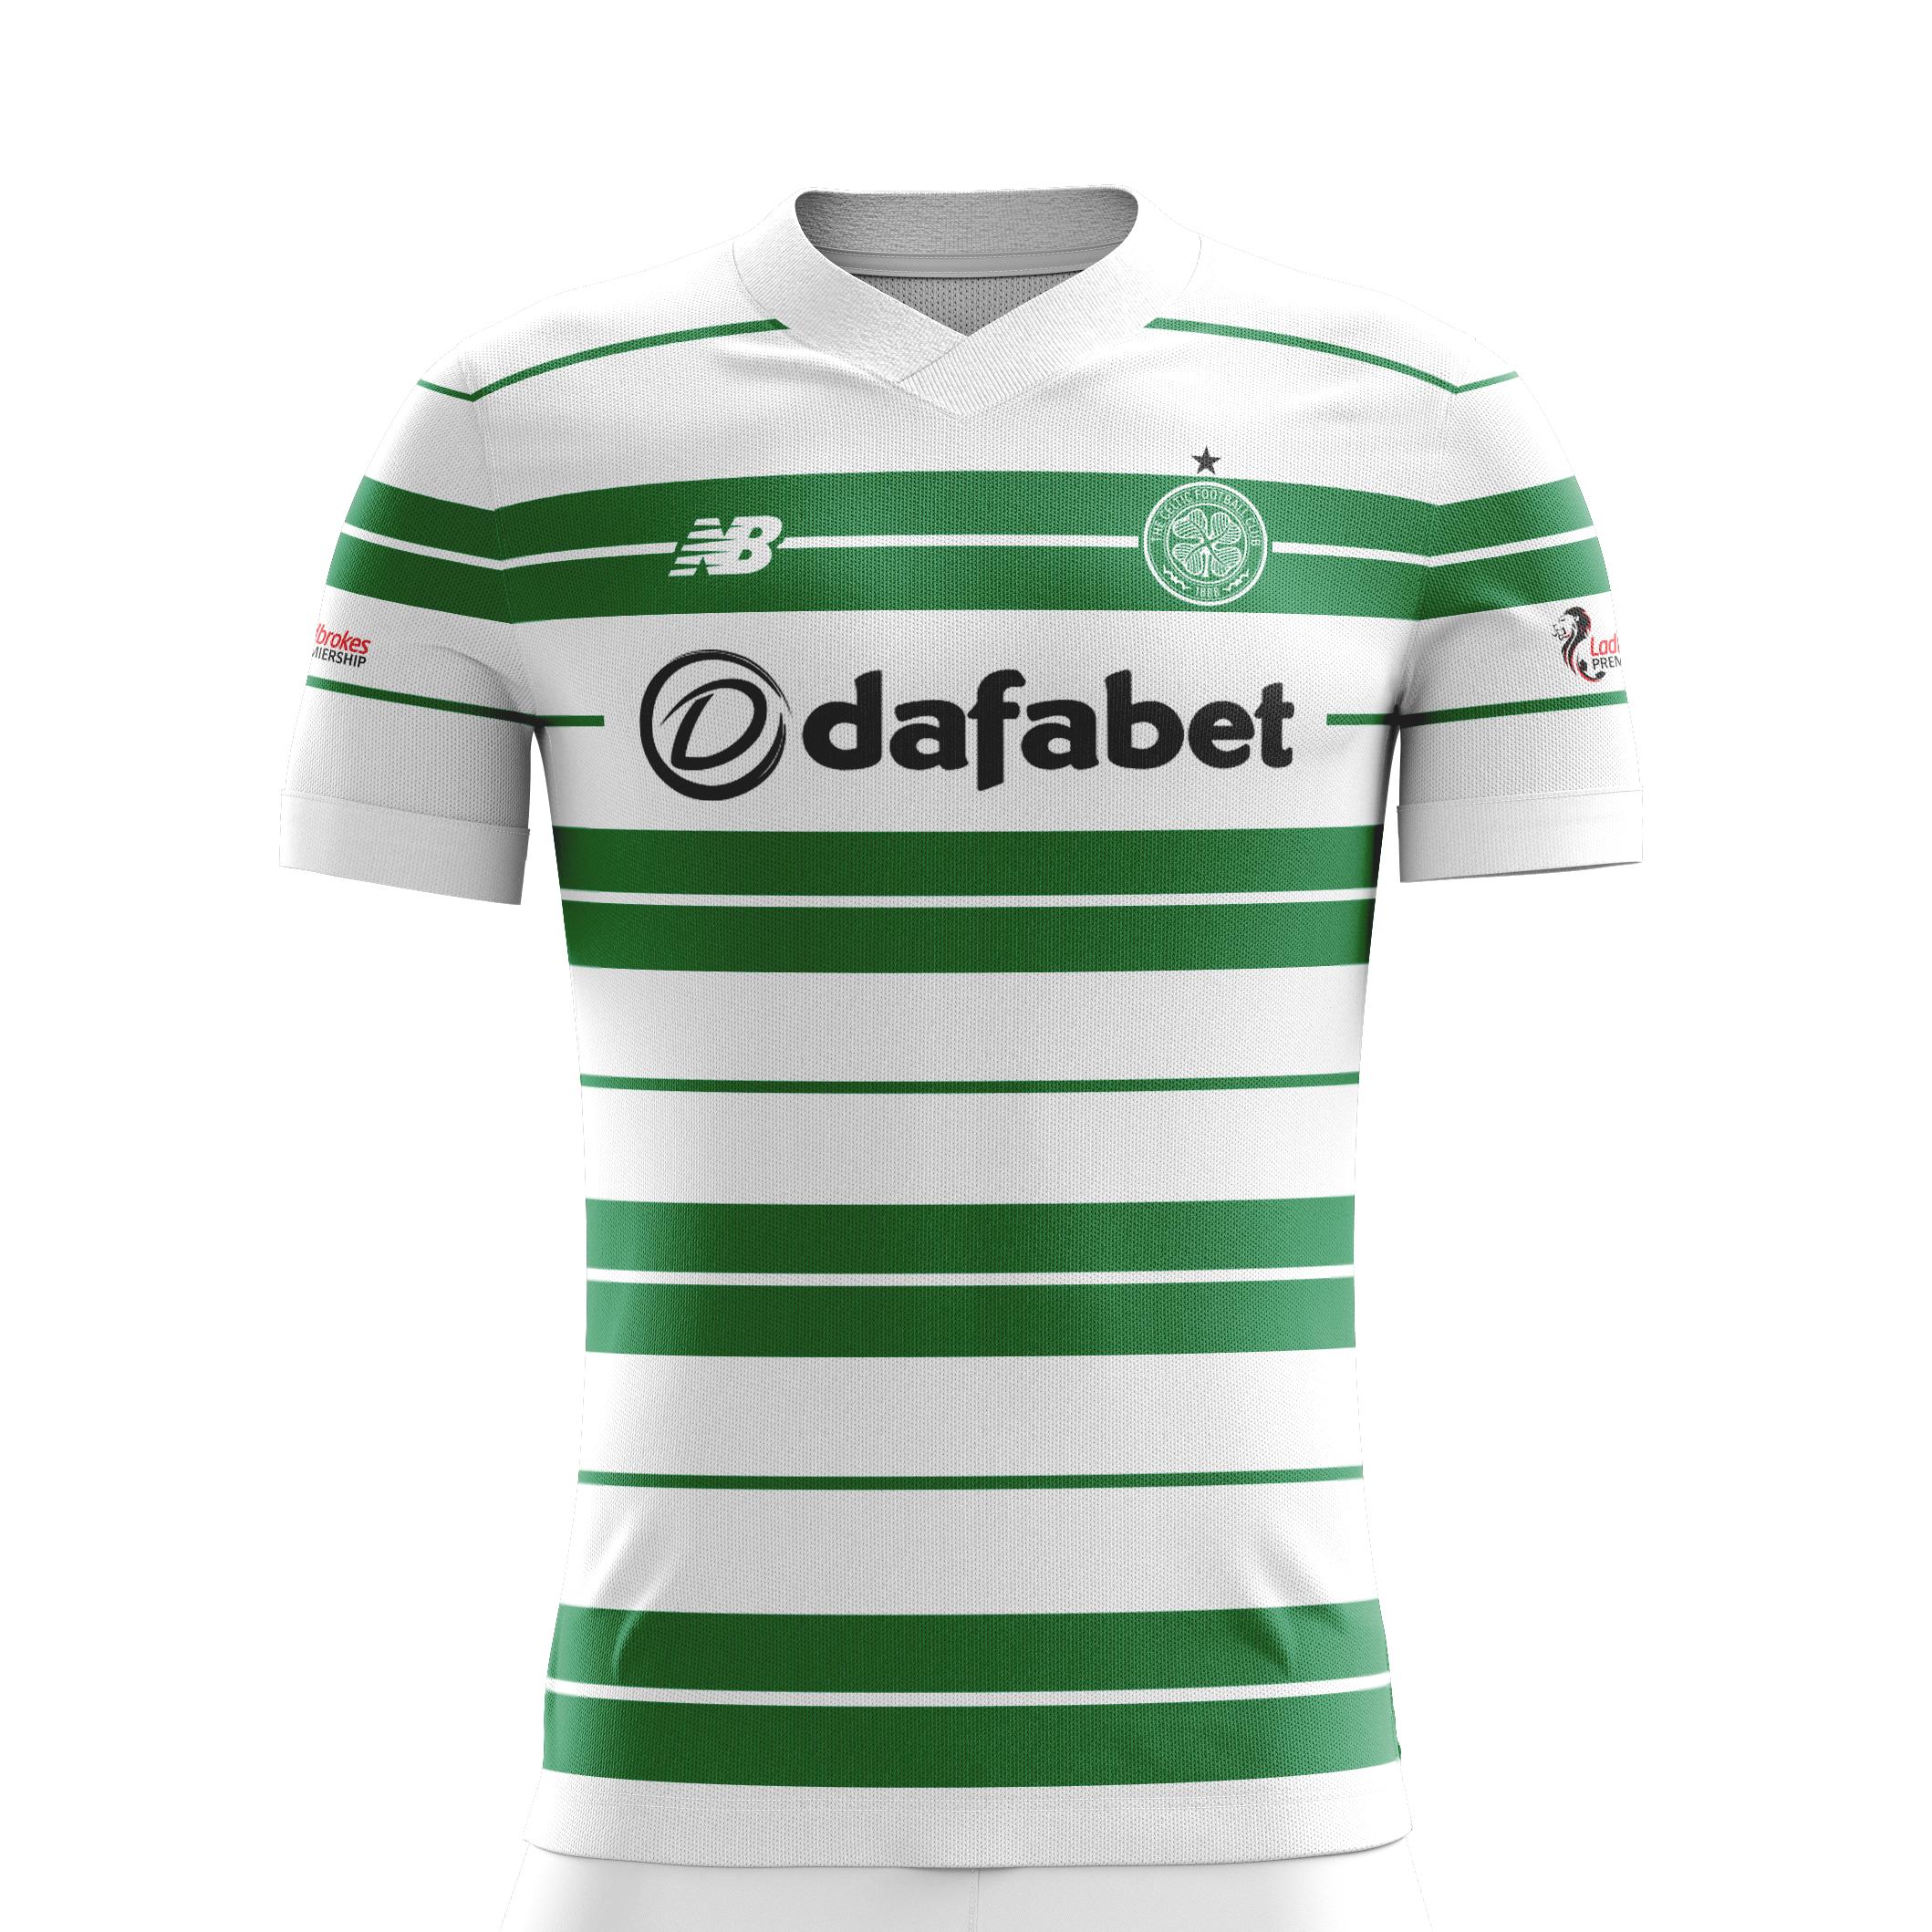 quality design fa3f5 24fa4 Pin by DPL Designs on Concept Football Kits | Football kits ...